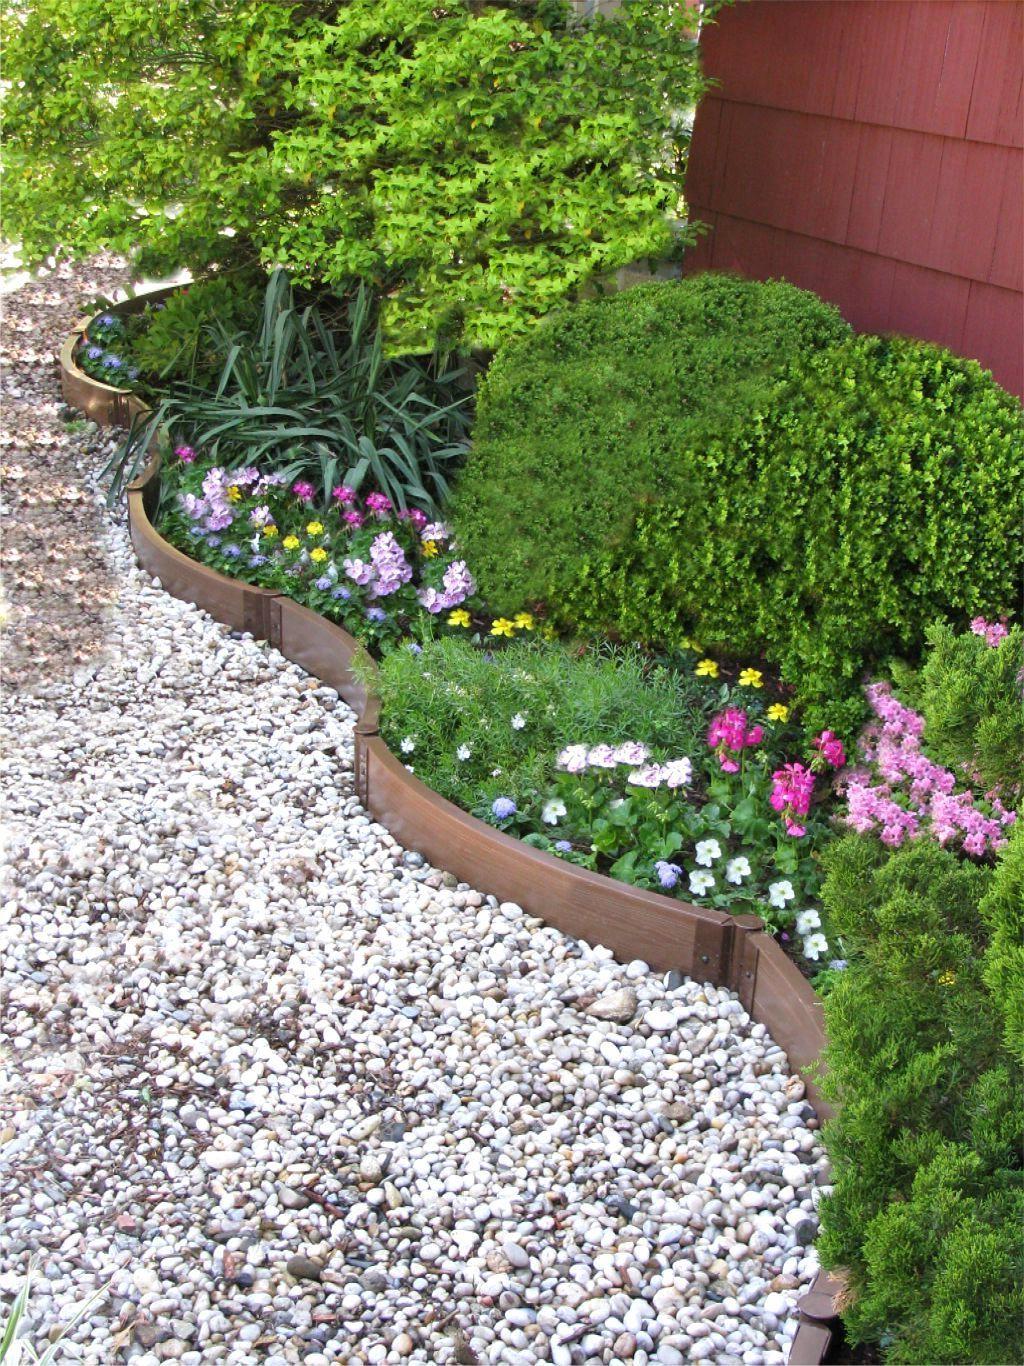 kiesgarten anlegen: diy anleitung und 42 kreative ideen | garden